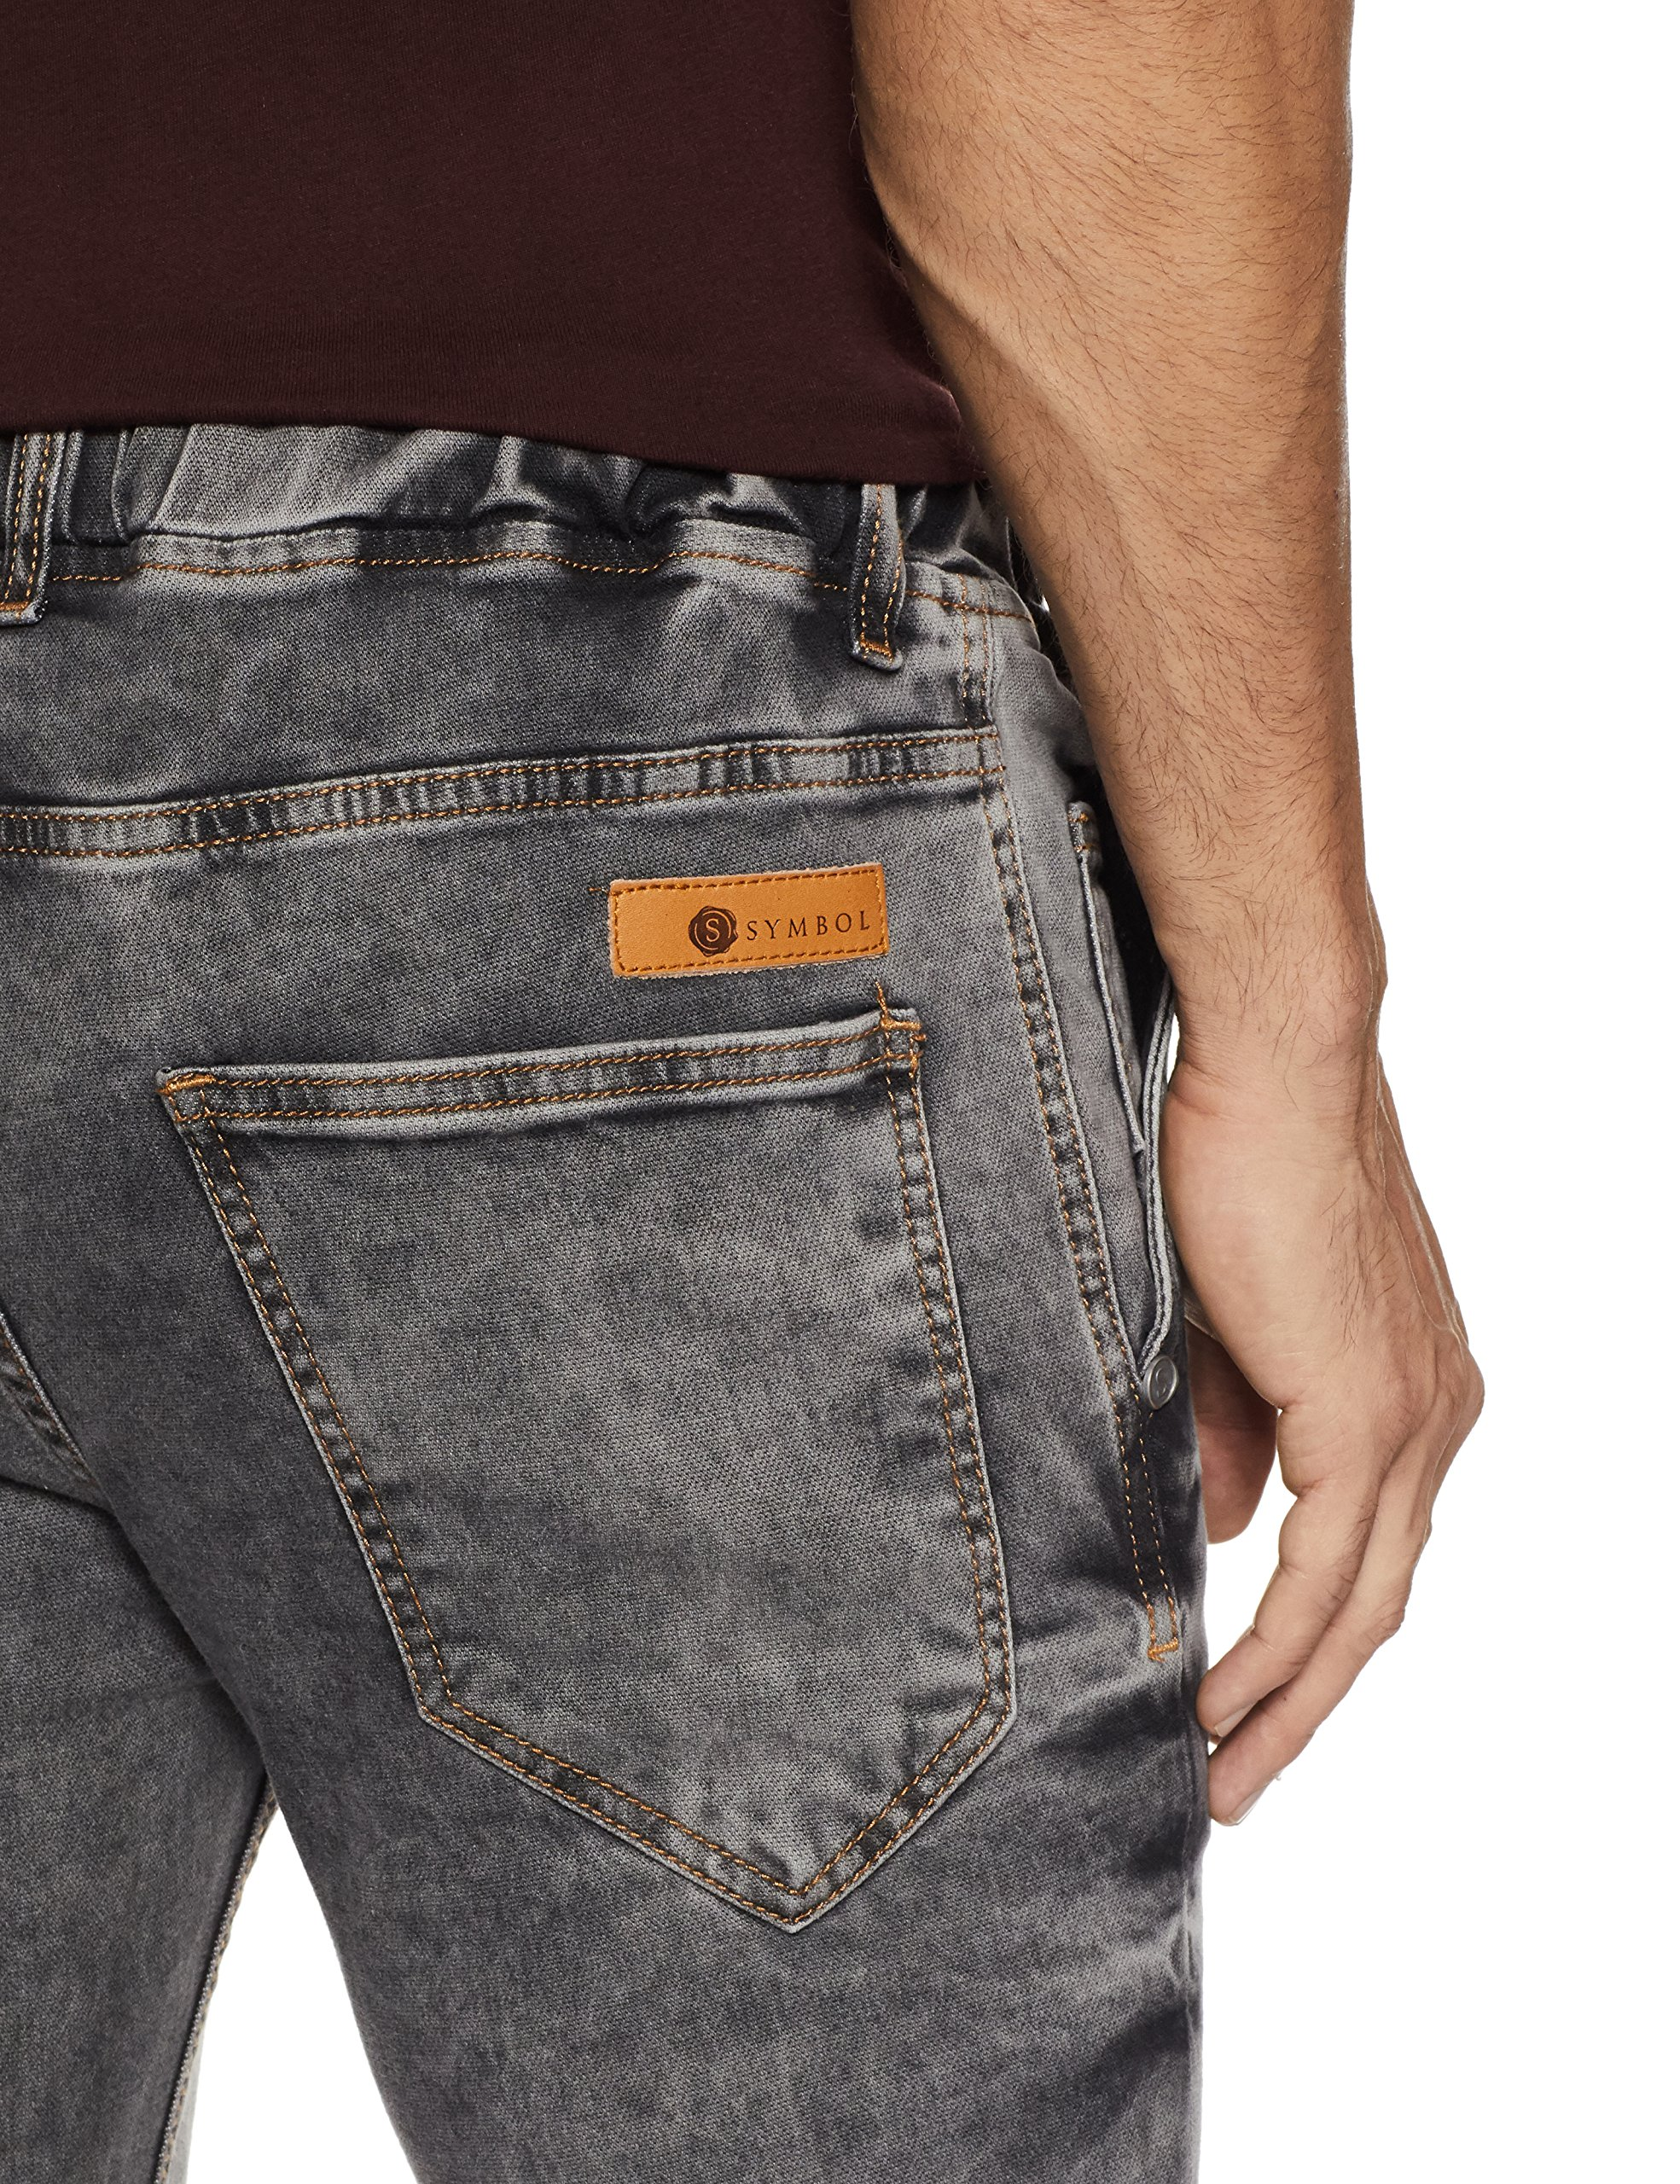 0a96a1bf Mens Dress Jeans Amazon - raveitsafe